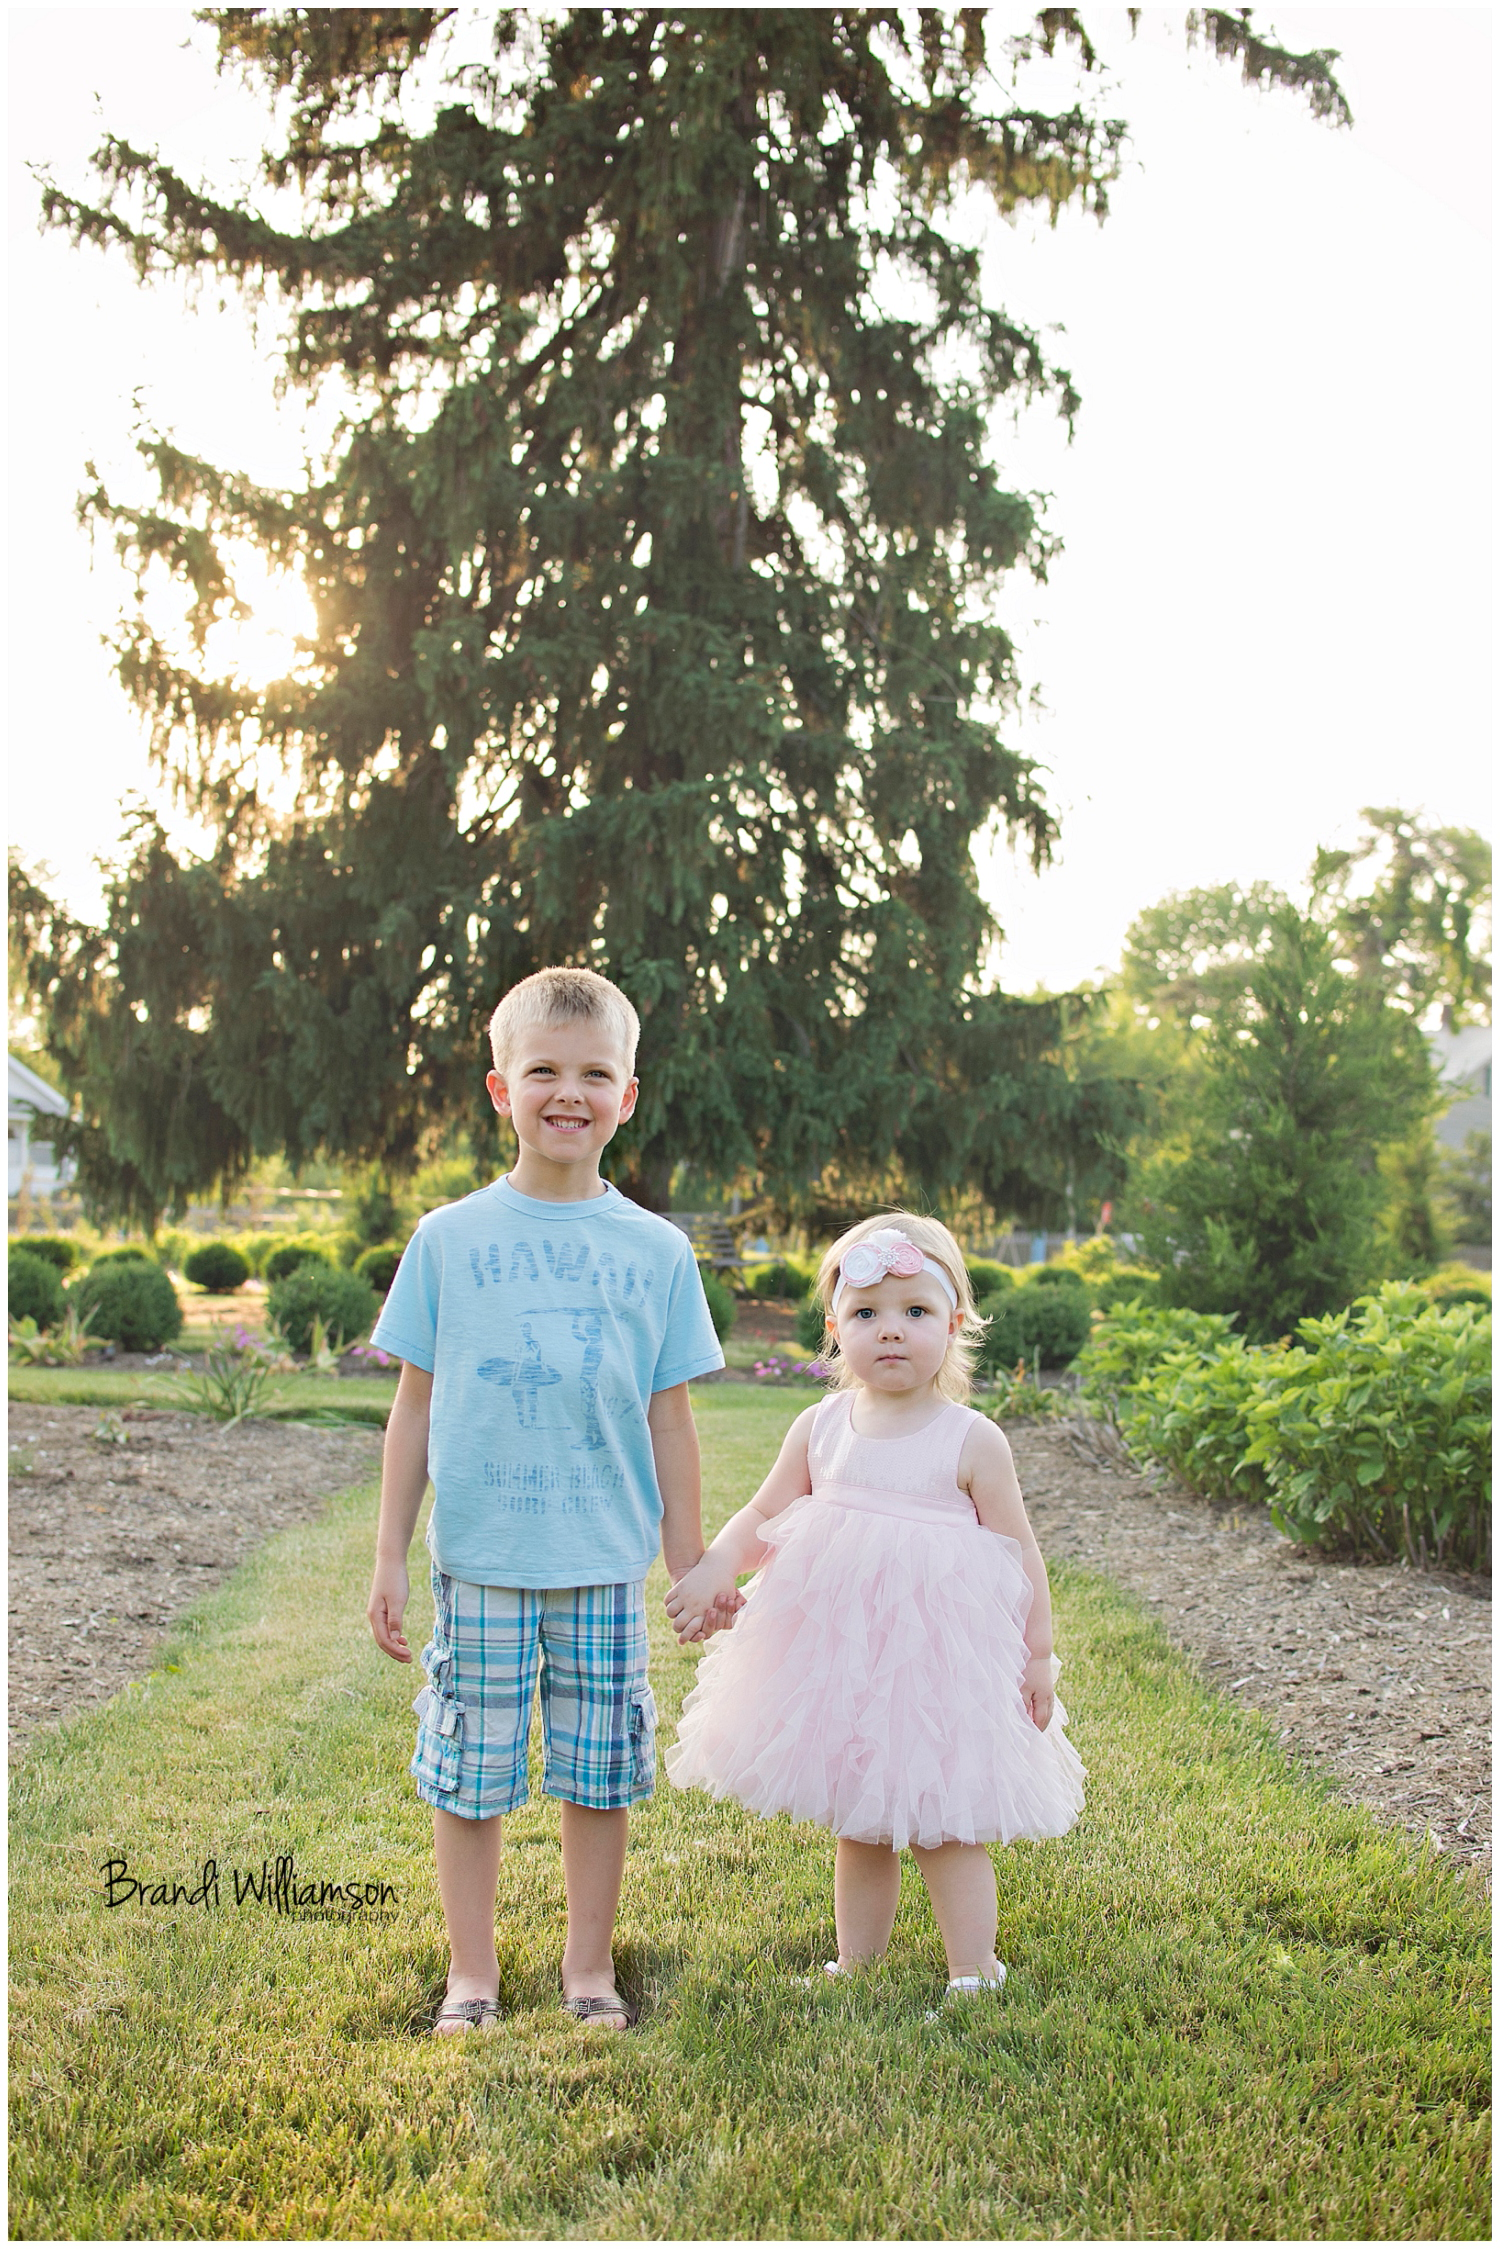 © Brandi Williamson Photography |NE Ohio Photographer | siblings